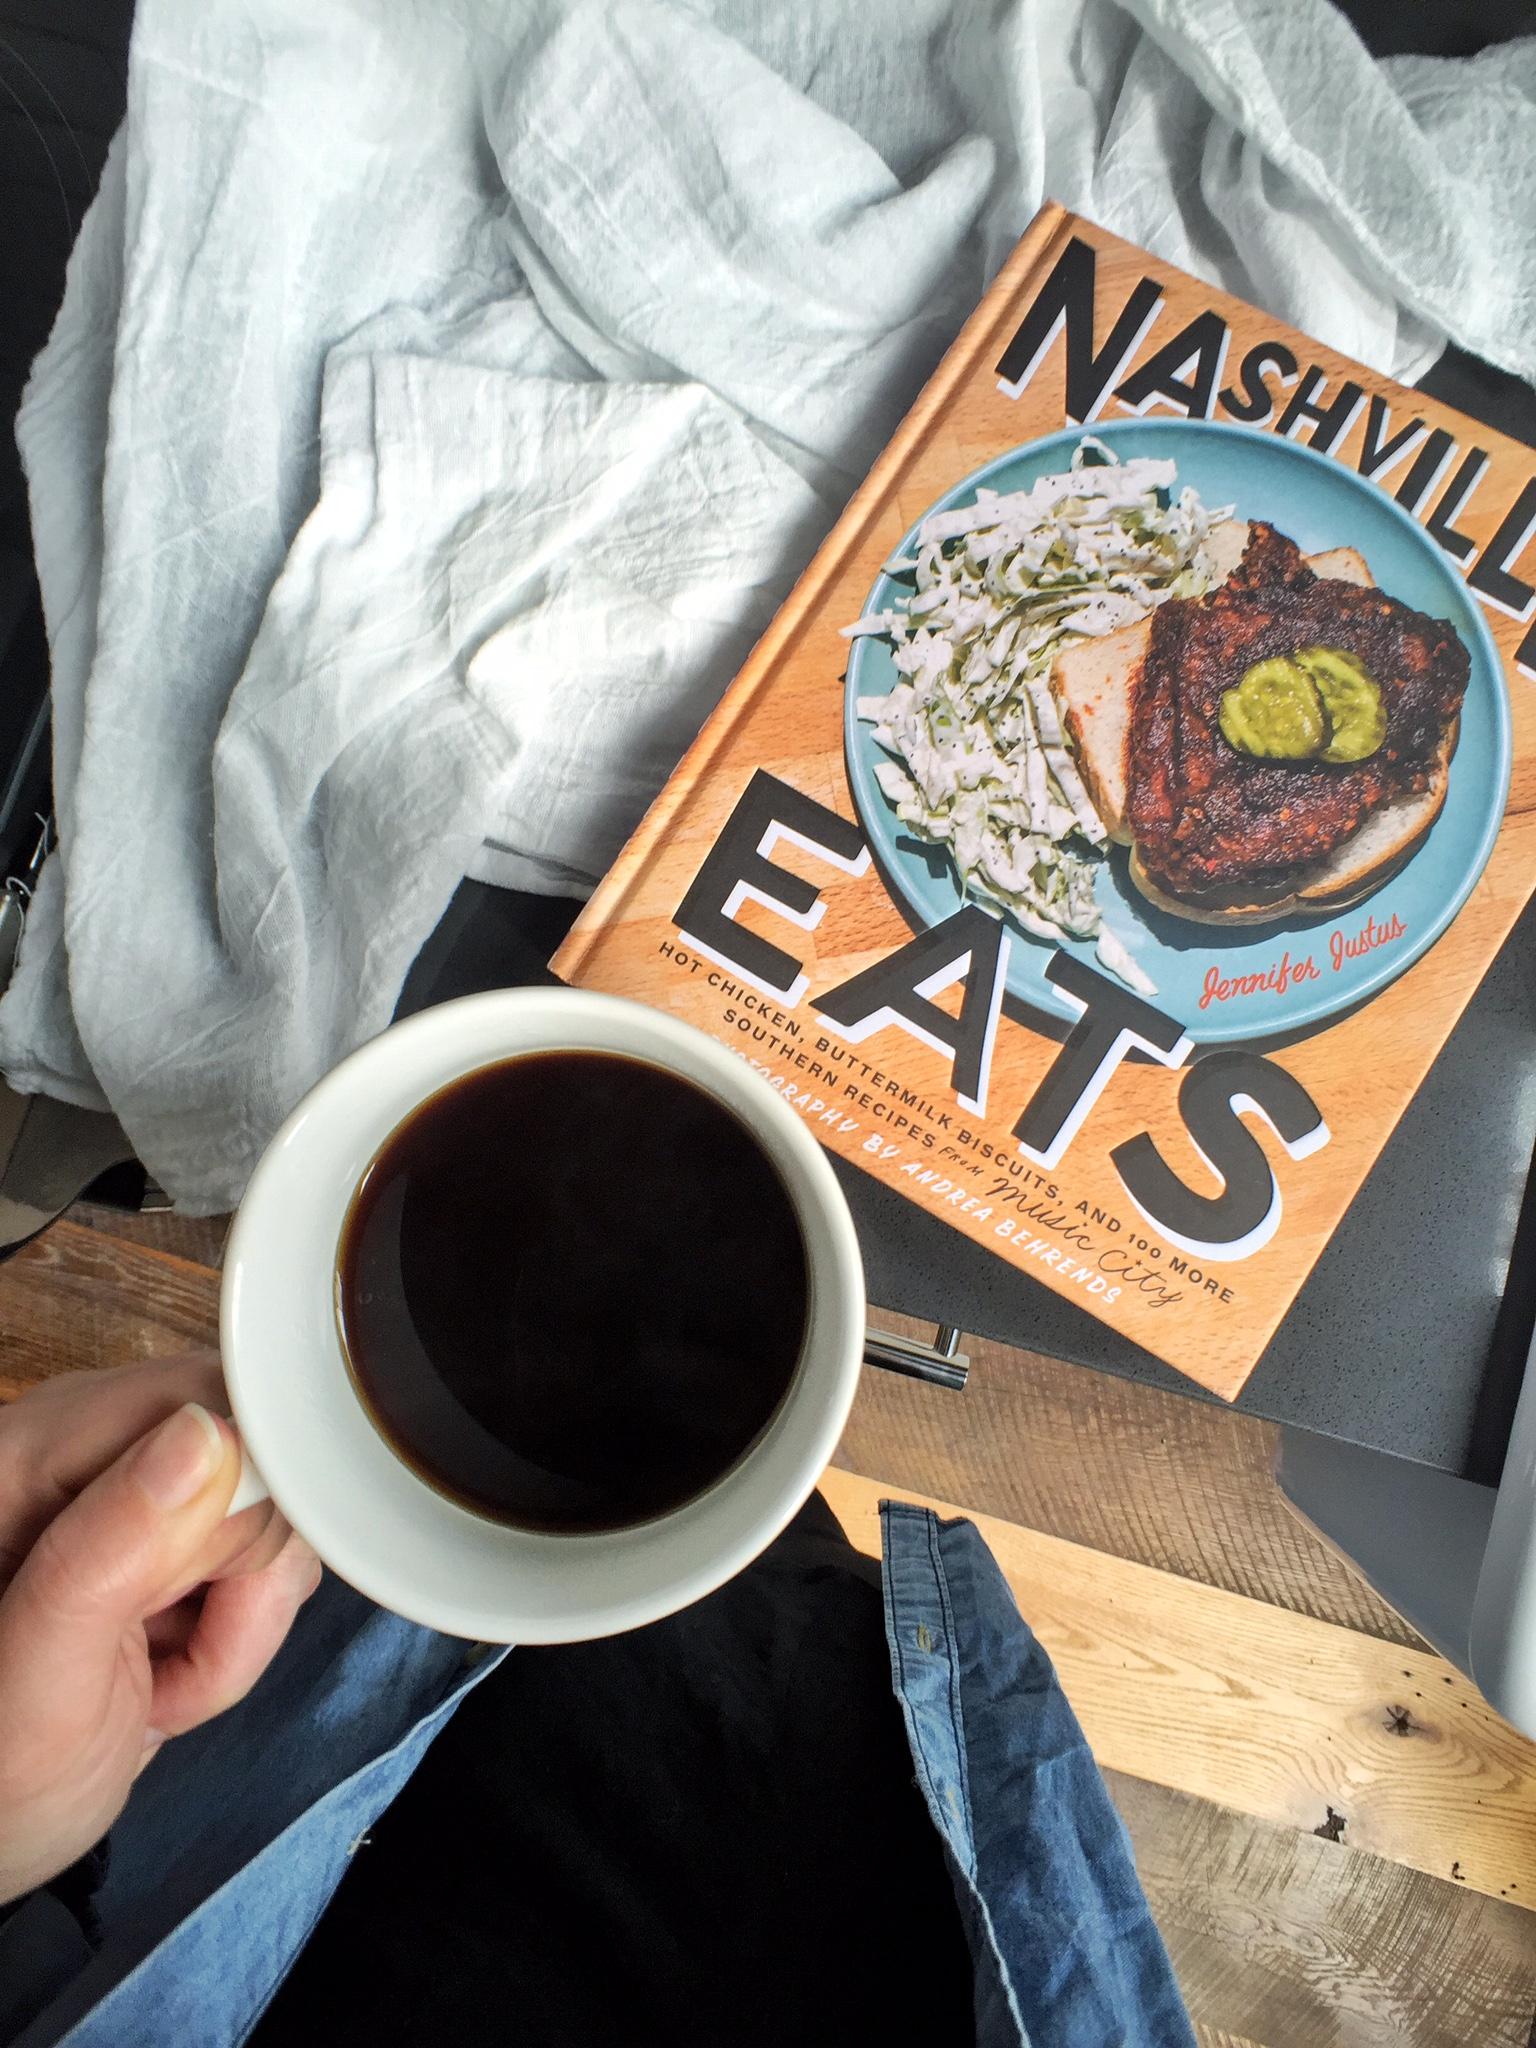 Nashville Eats Book.JPG